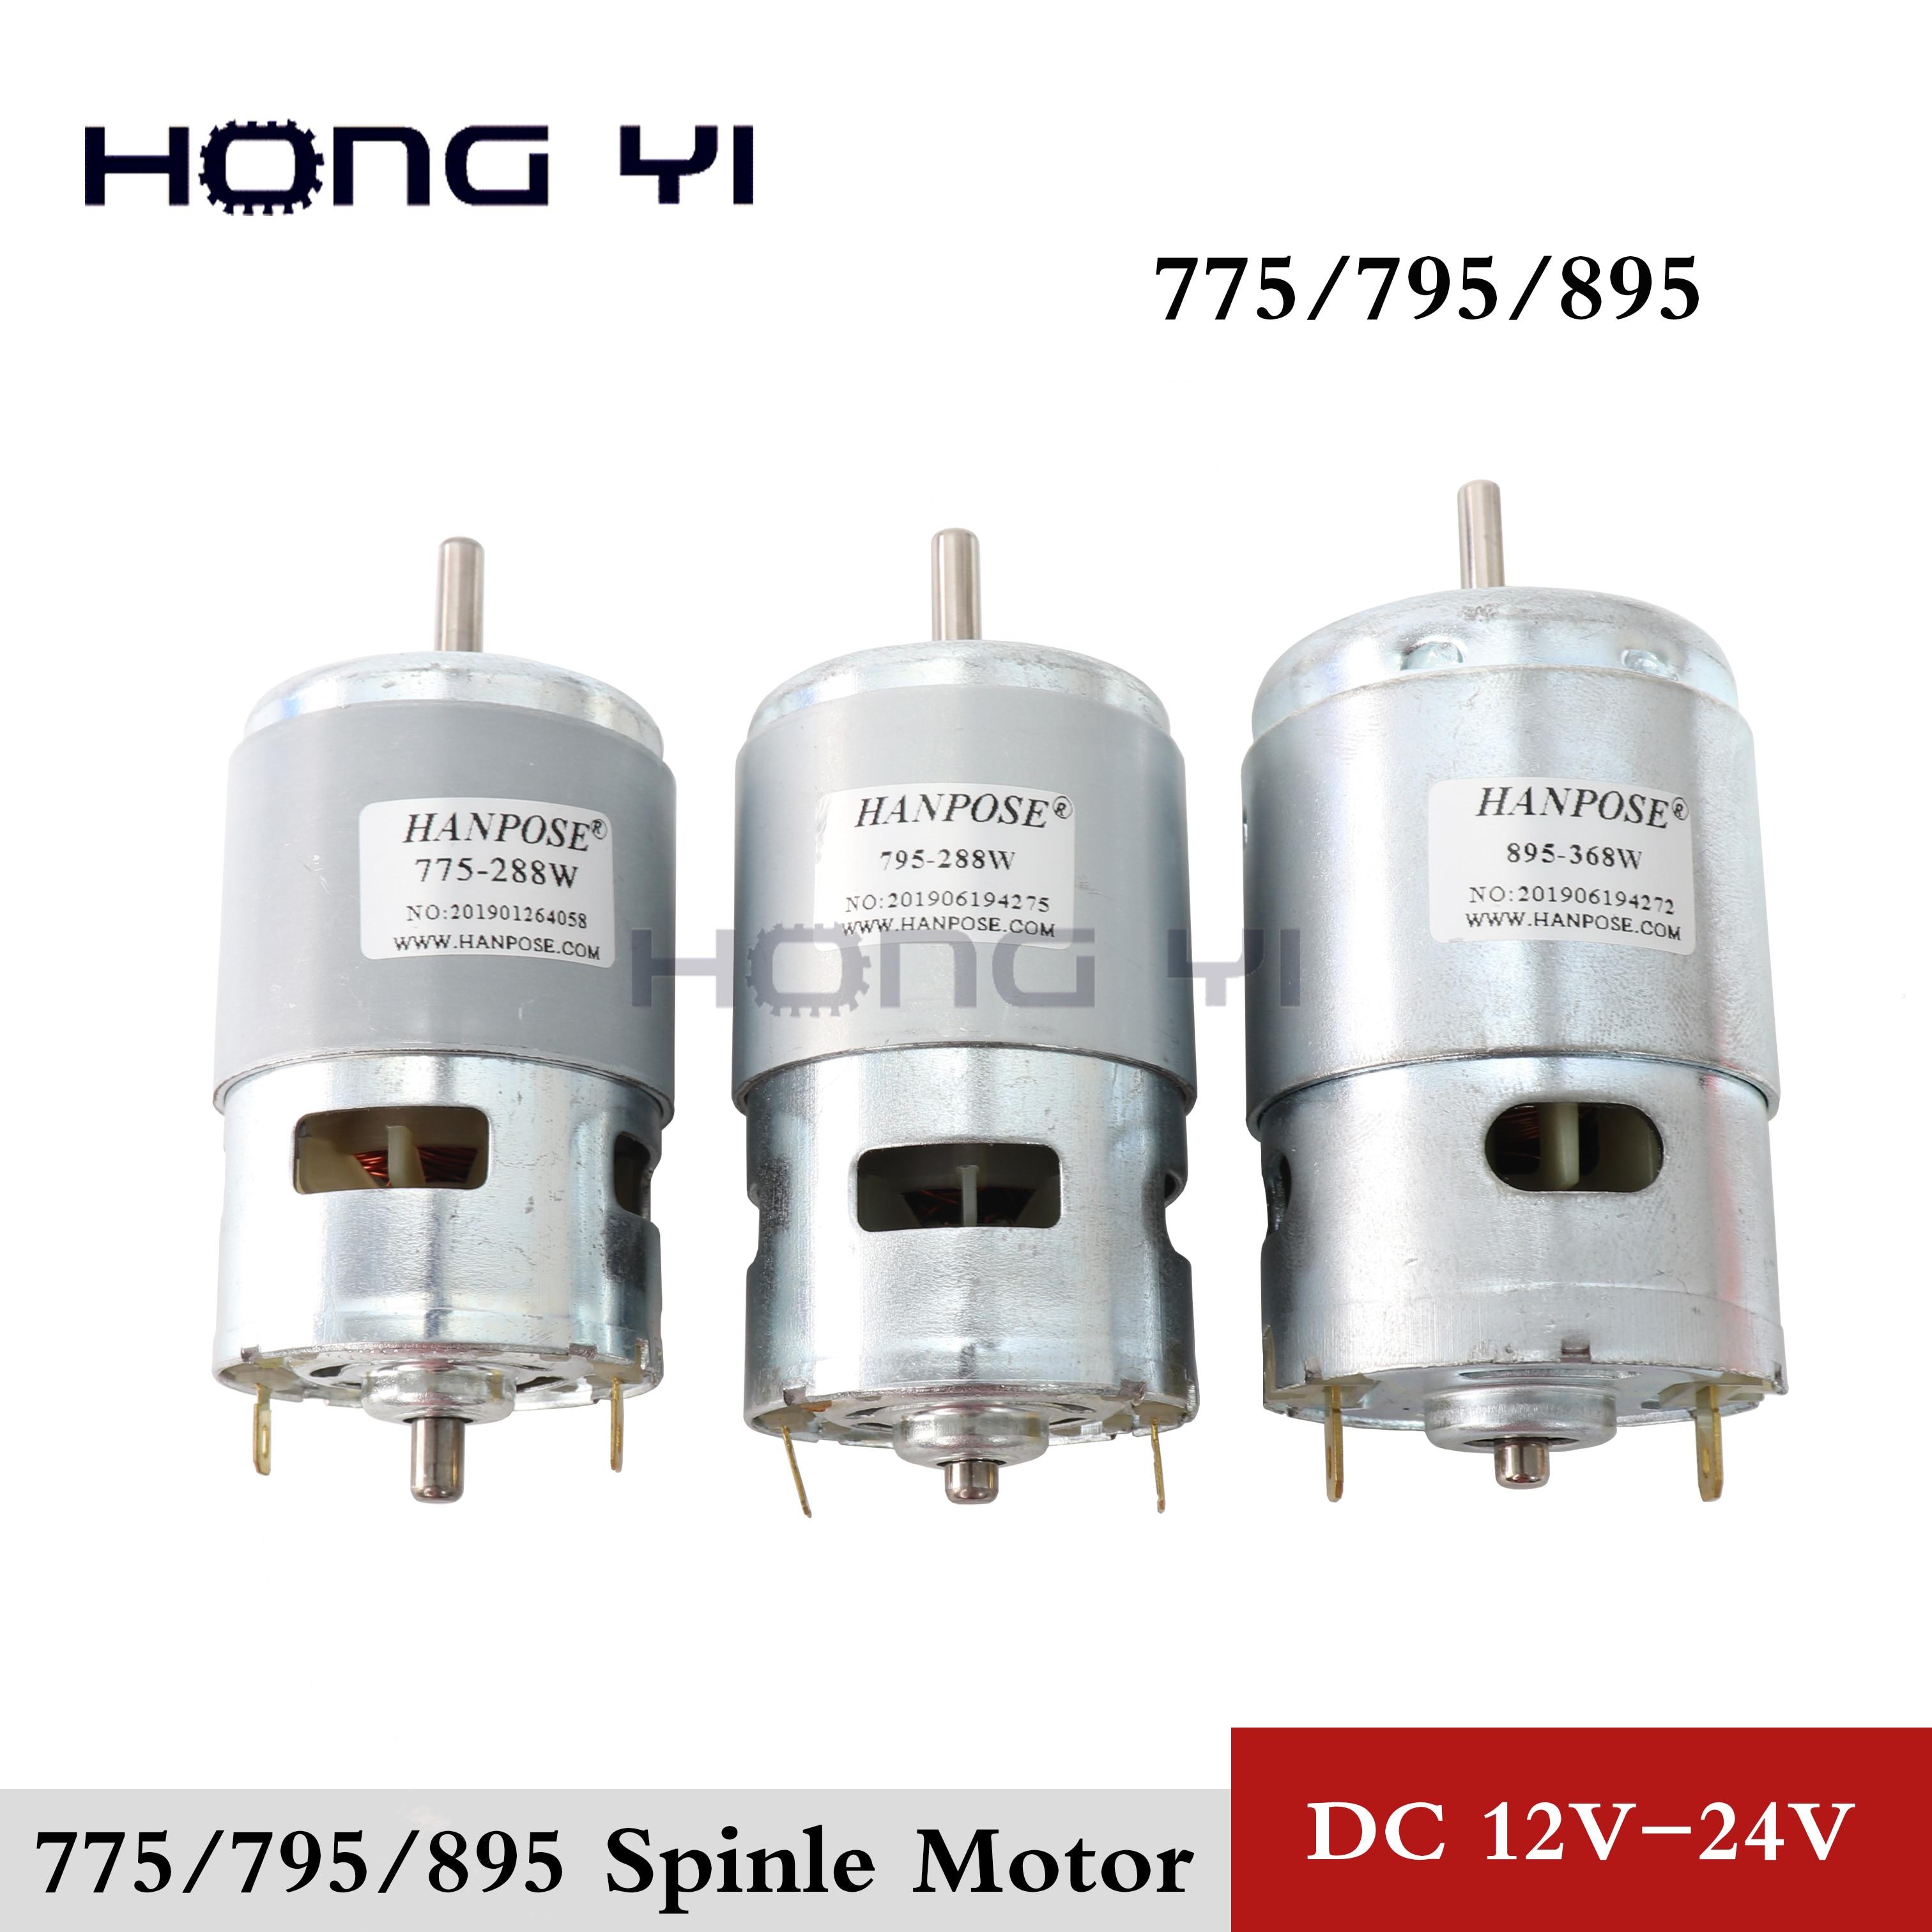 775 795 895 Motor Durable/Motor Bracket DC 12V-24V 3000-15000RPM Motor Large Torque Gear Motor For Engraving Machine Lathe Tool